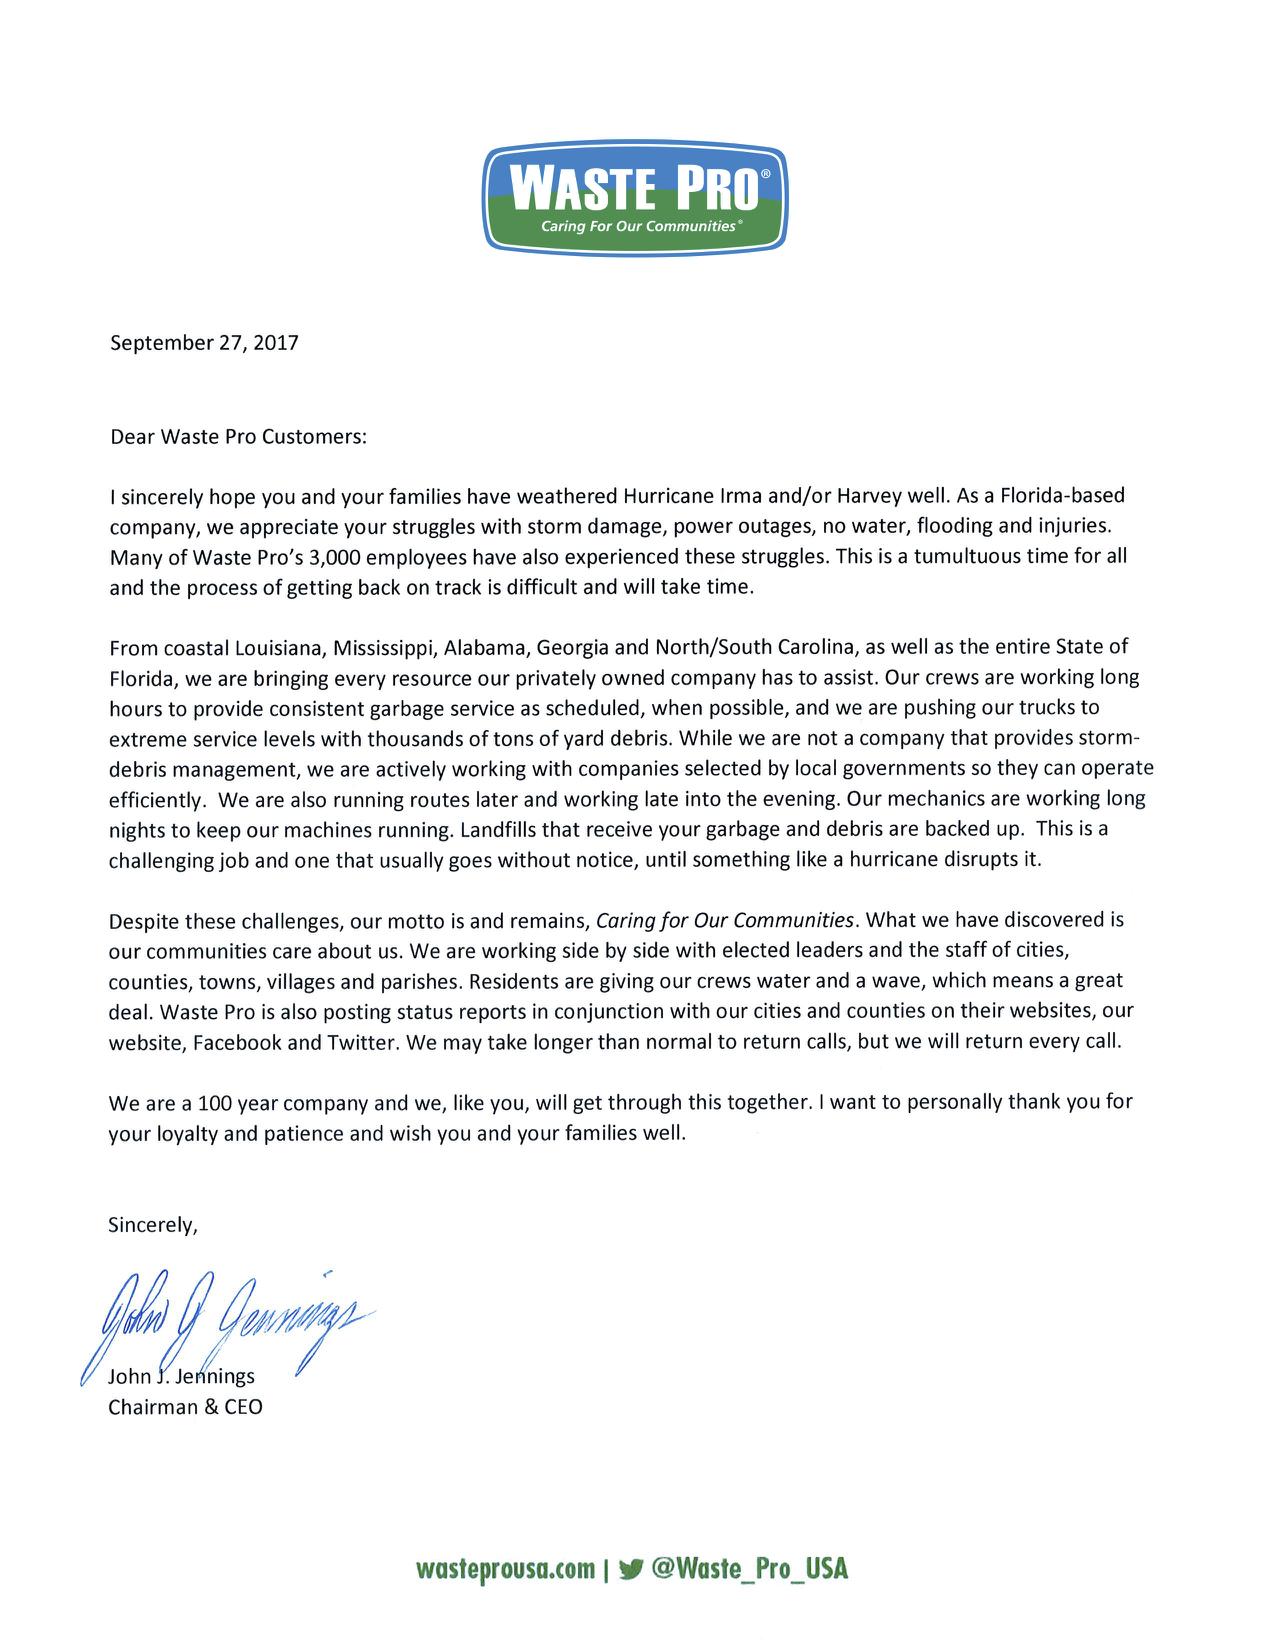 Storm Letter From Chairman & CEO John Jennings